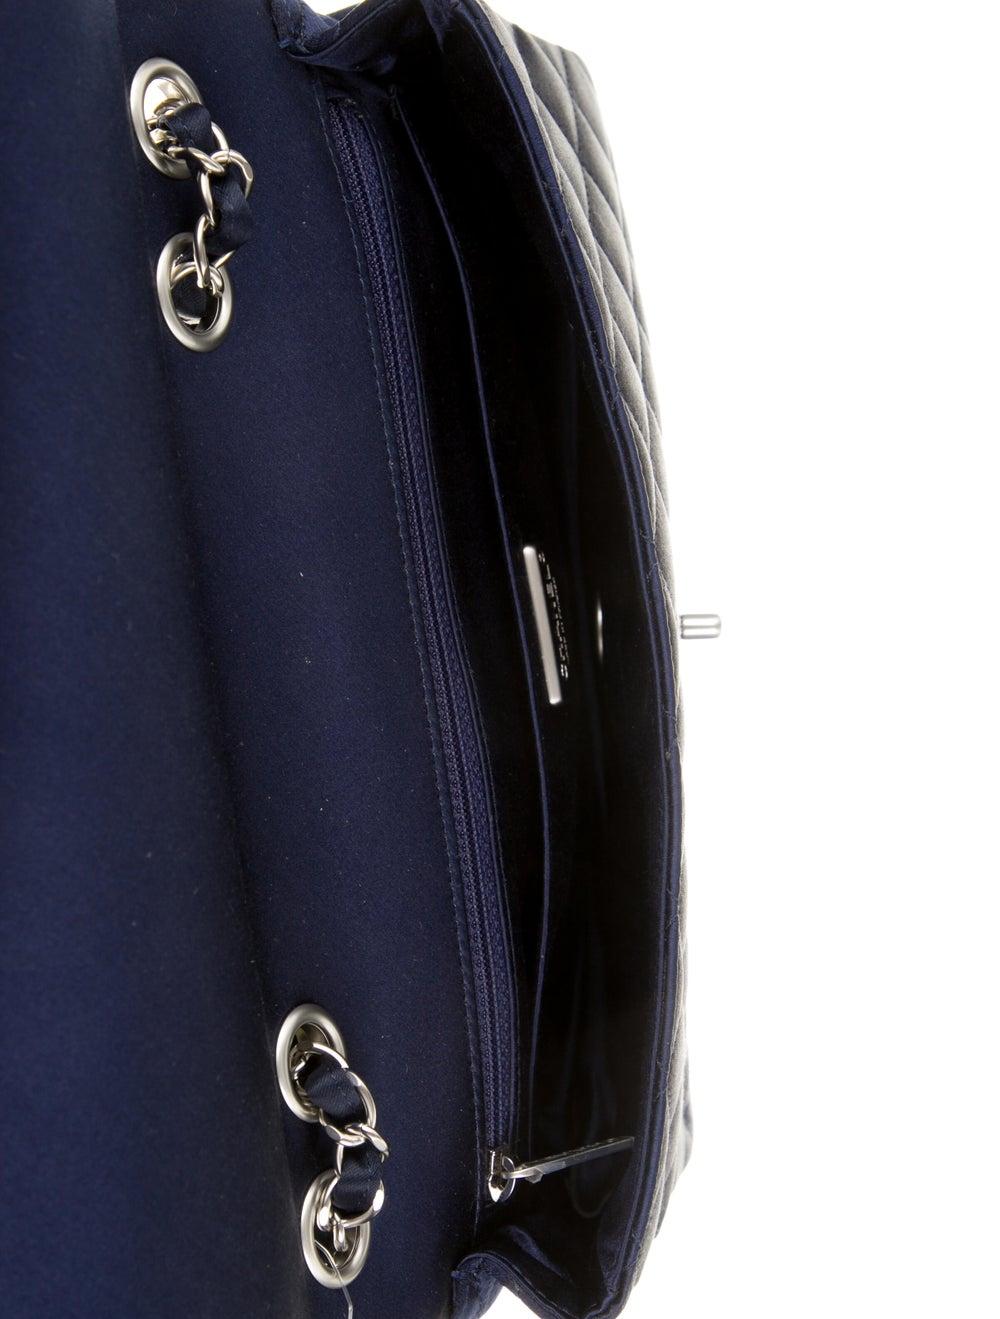 Chanel Satin LED Flap Bag Blue - image 5